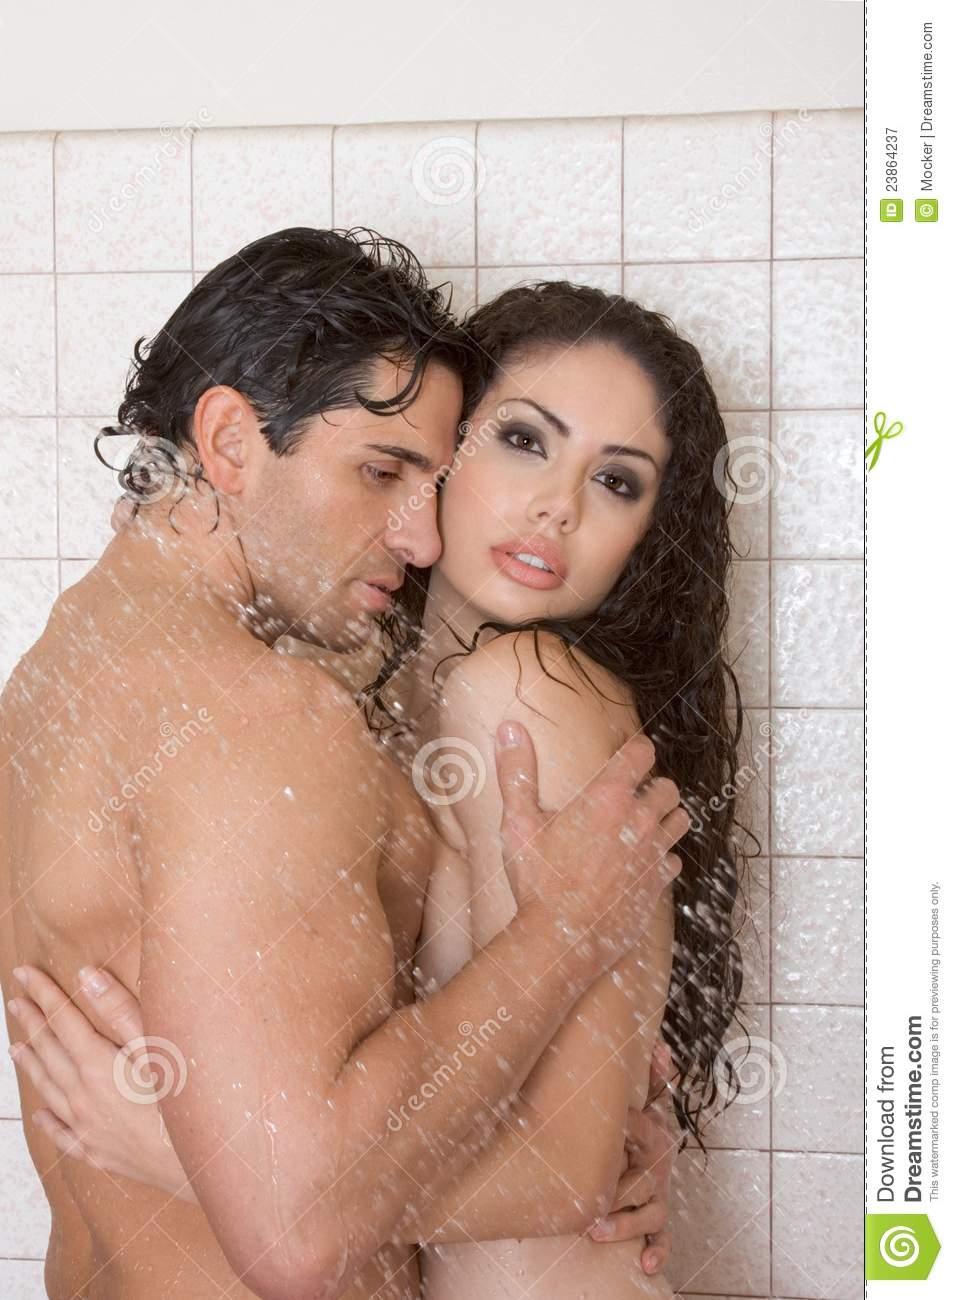 Boys fucking girls with big dildos